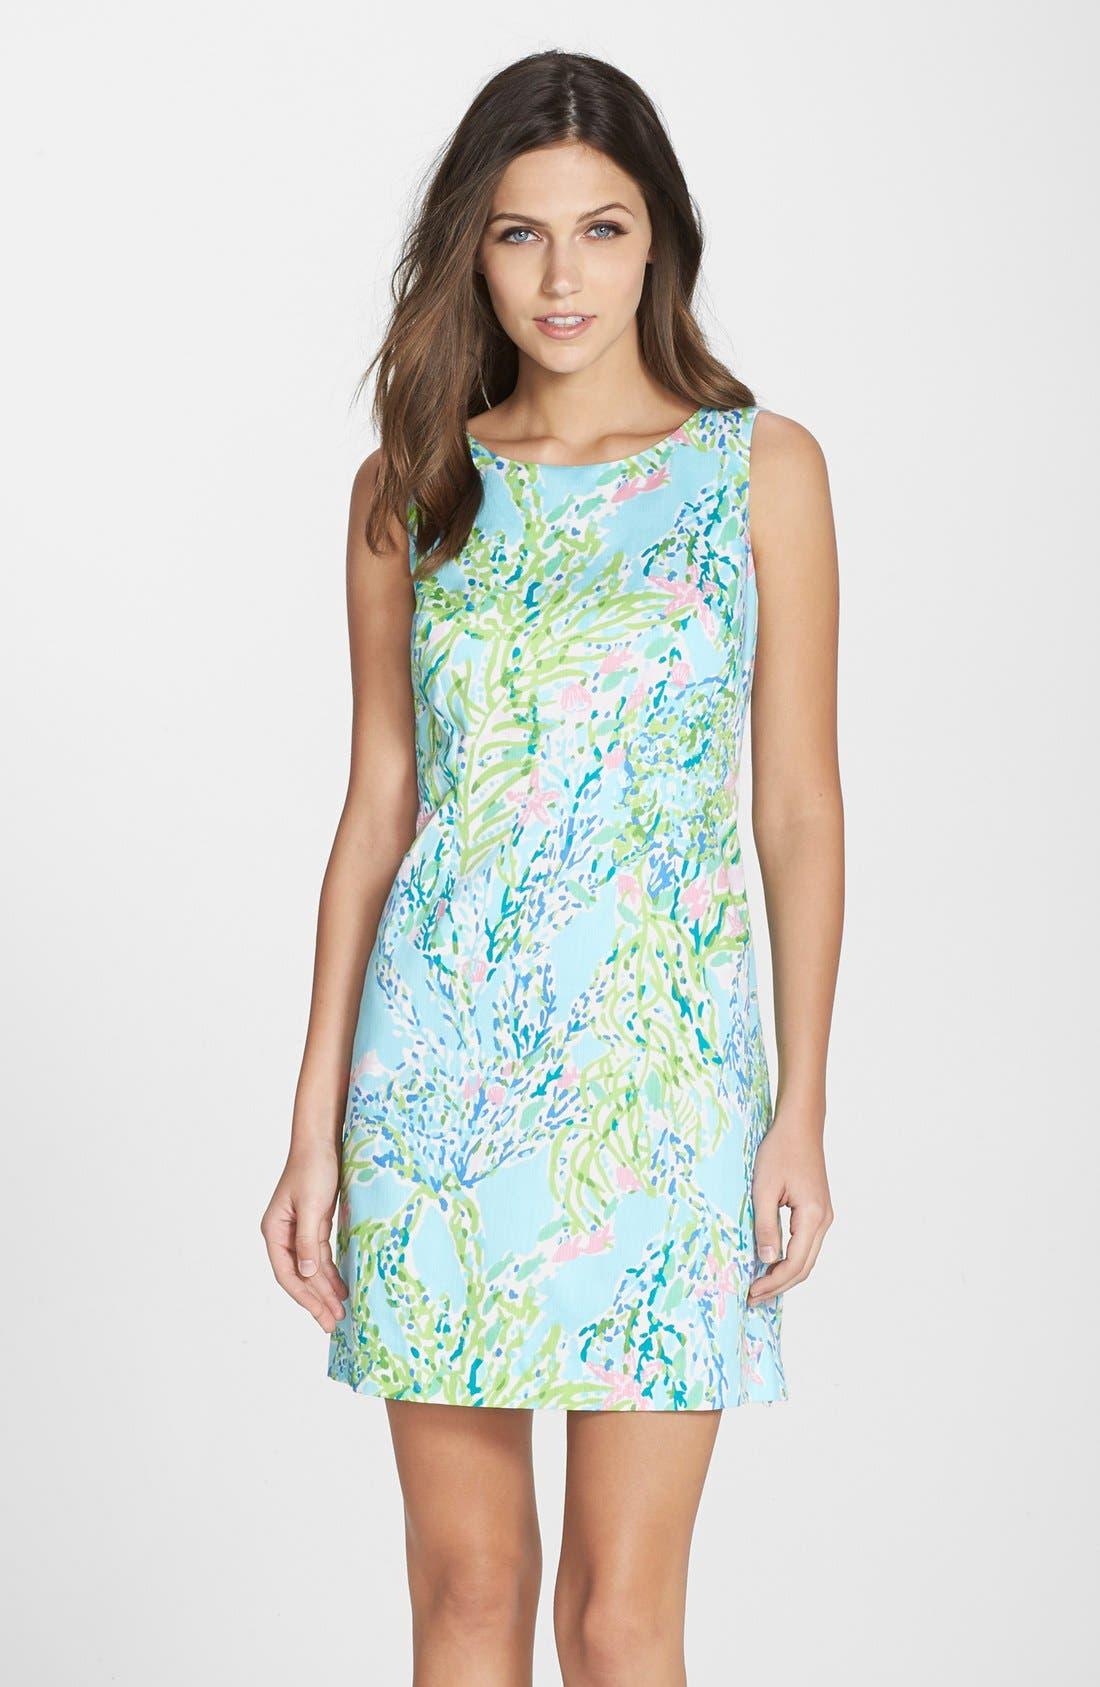 Main Image - Lilly Pulitzer® 'Cathy' Cotton Shift Dress